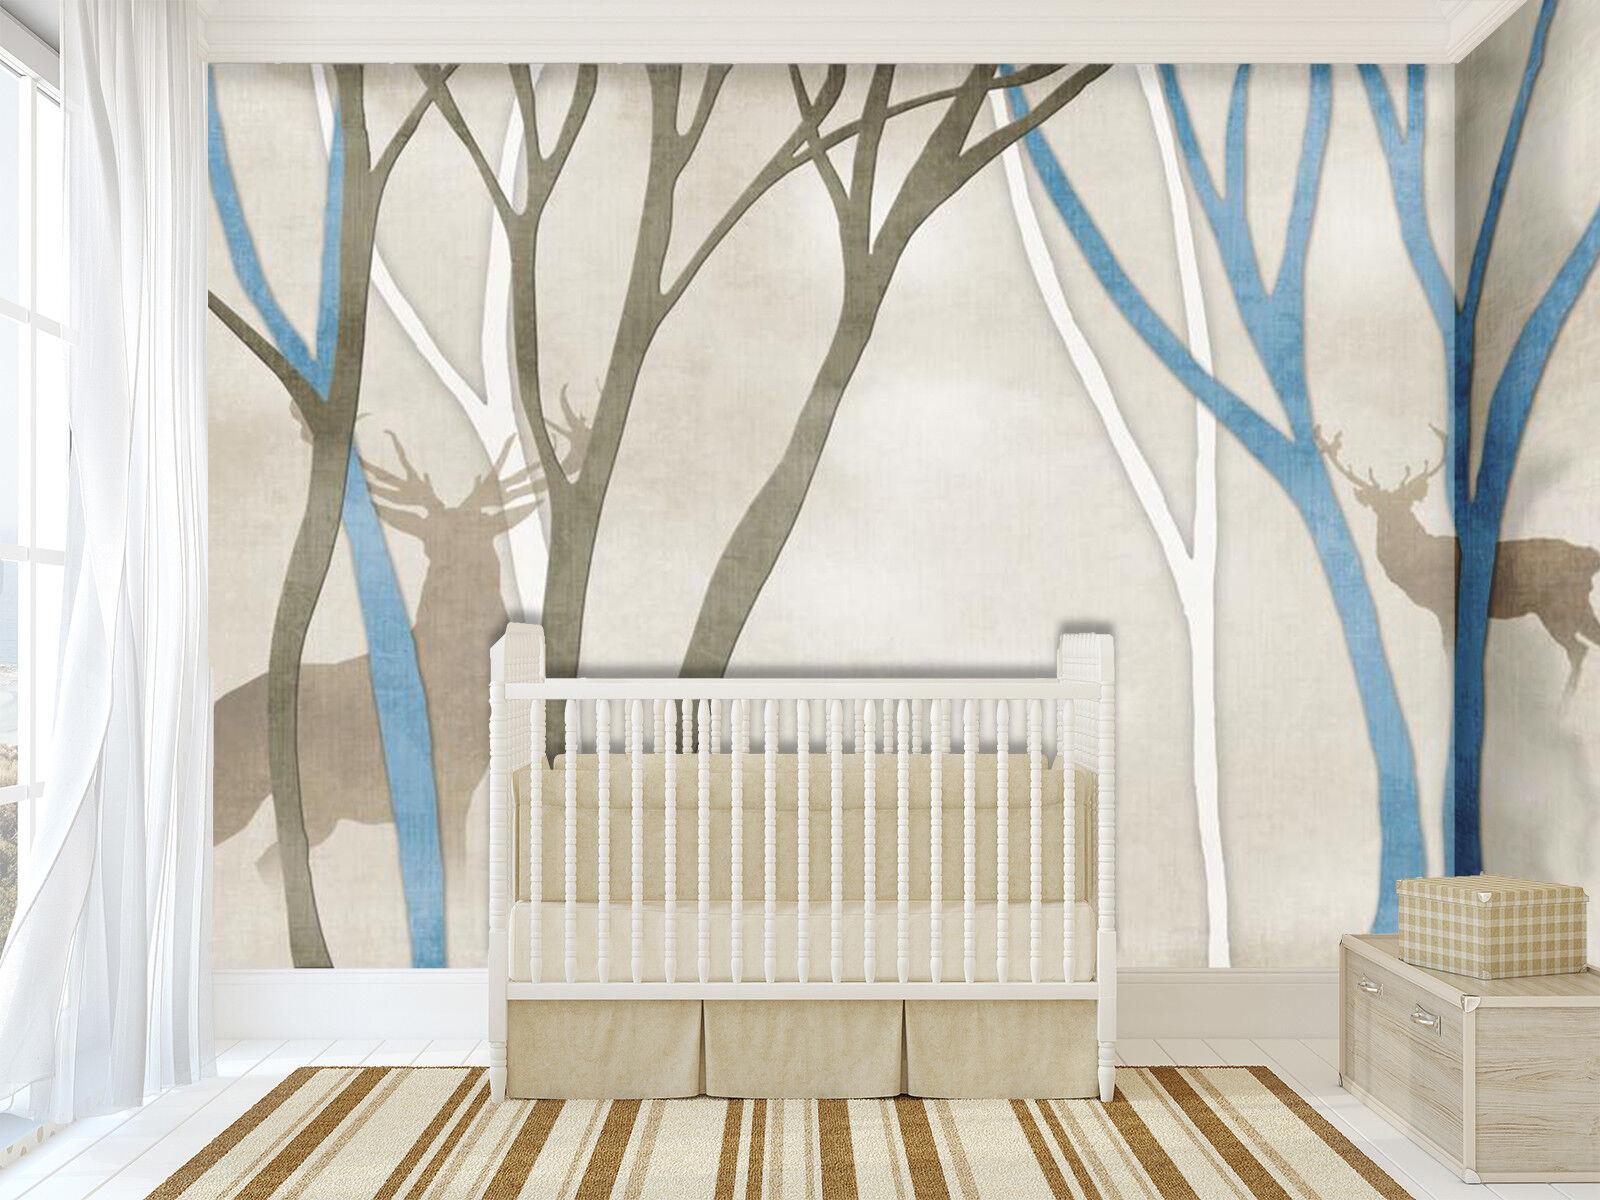 3D Gemalt Wälder Hirsch 9053 9053 9053 Tapete Wandgemälde Tapeten Bild Familie DE Kyra 87e5bc